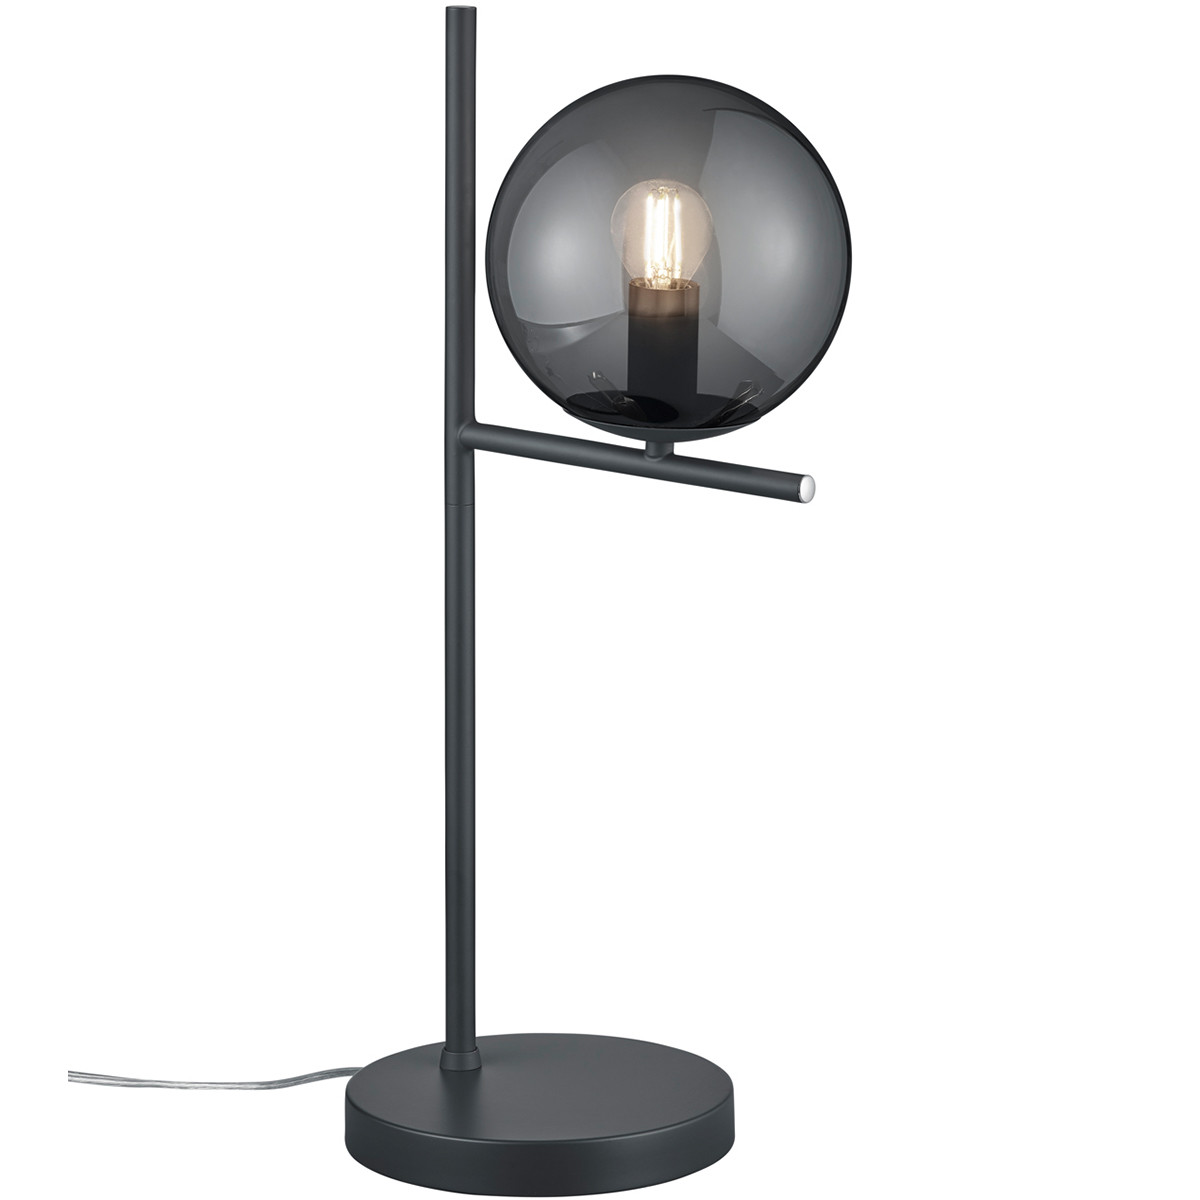 LED Tafellamp - Trion Pora - E14 Fitting - Rond - Mat Zwart Rookglas - Aluminium